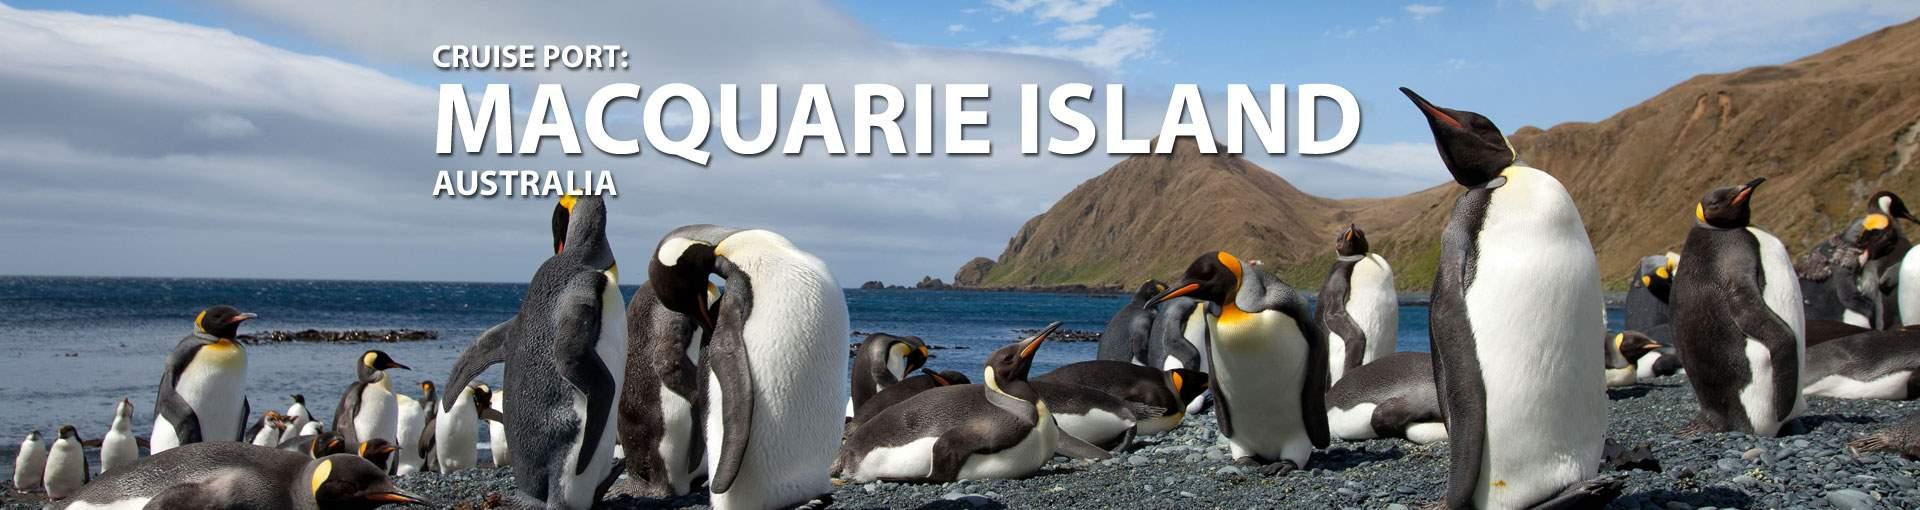 Cruises to Macquarie Island, Australia